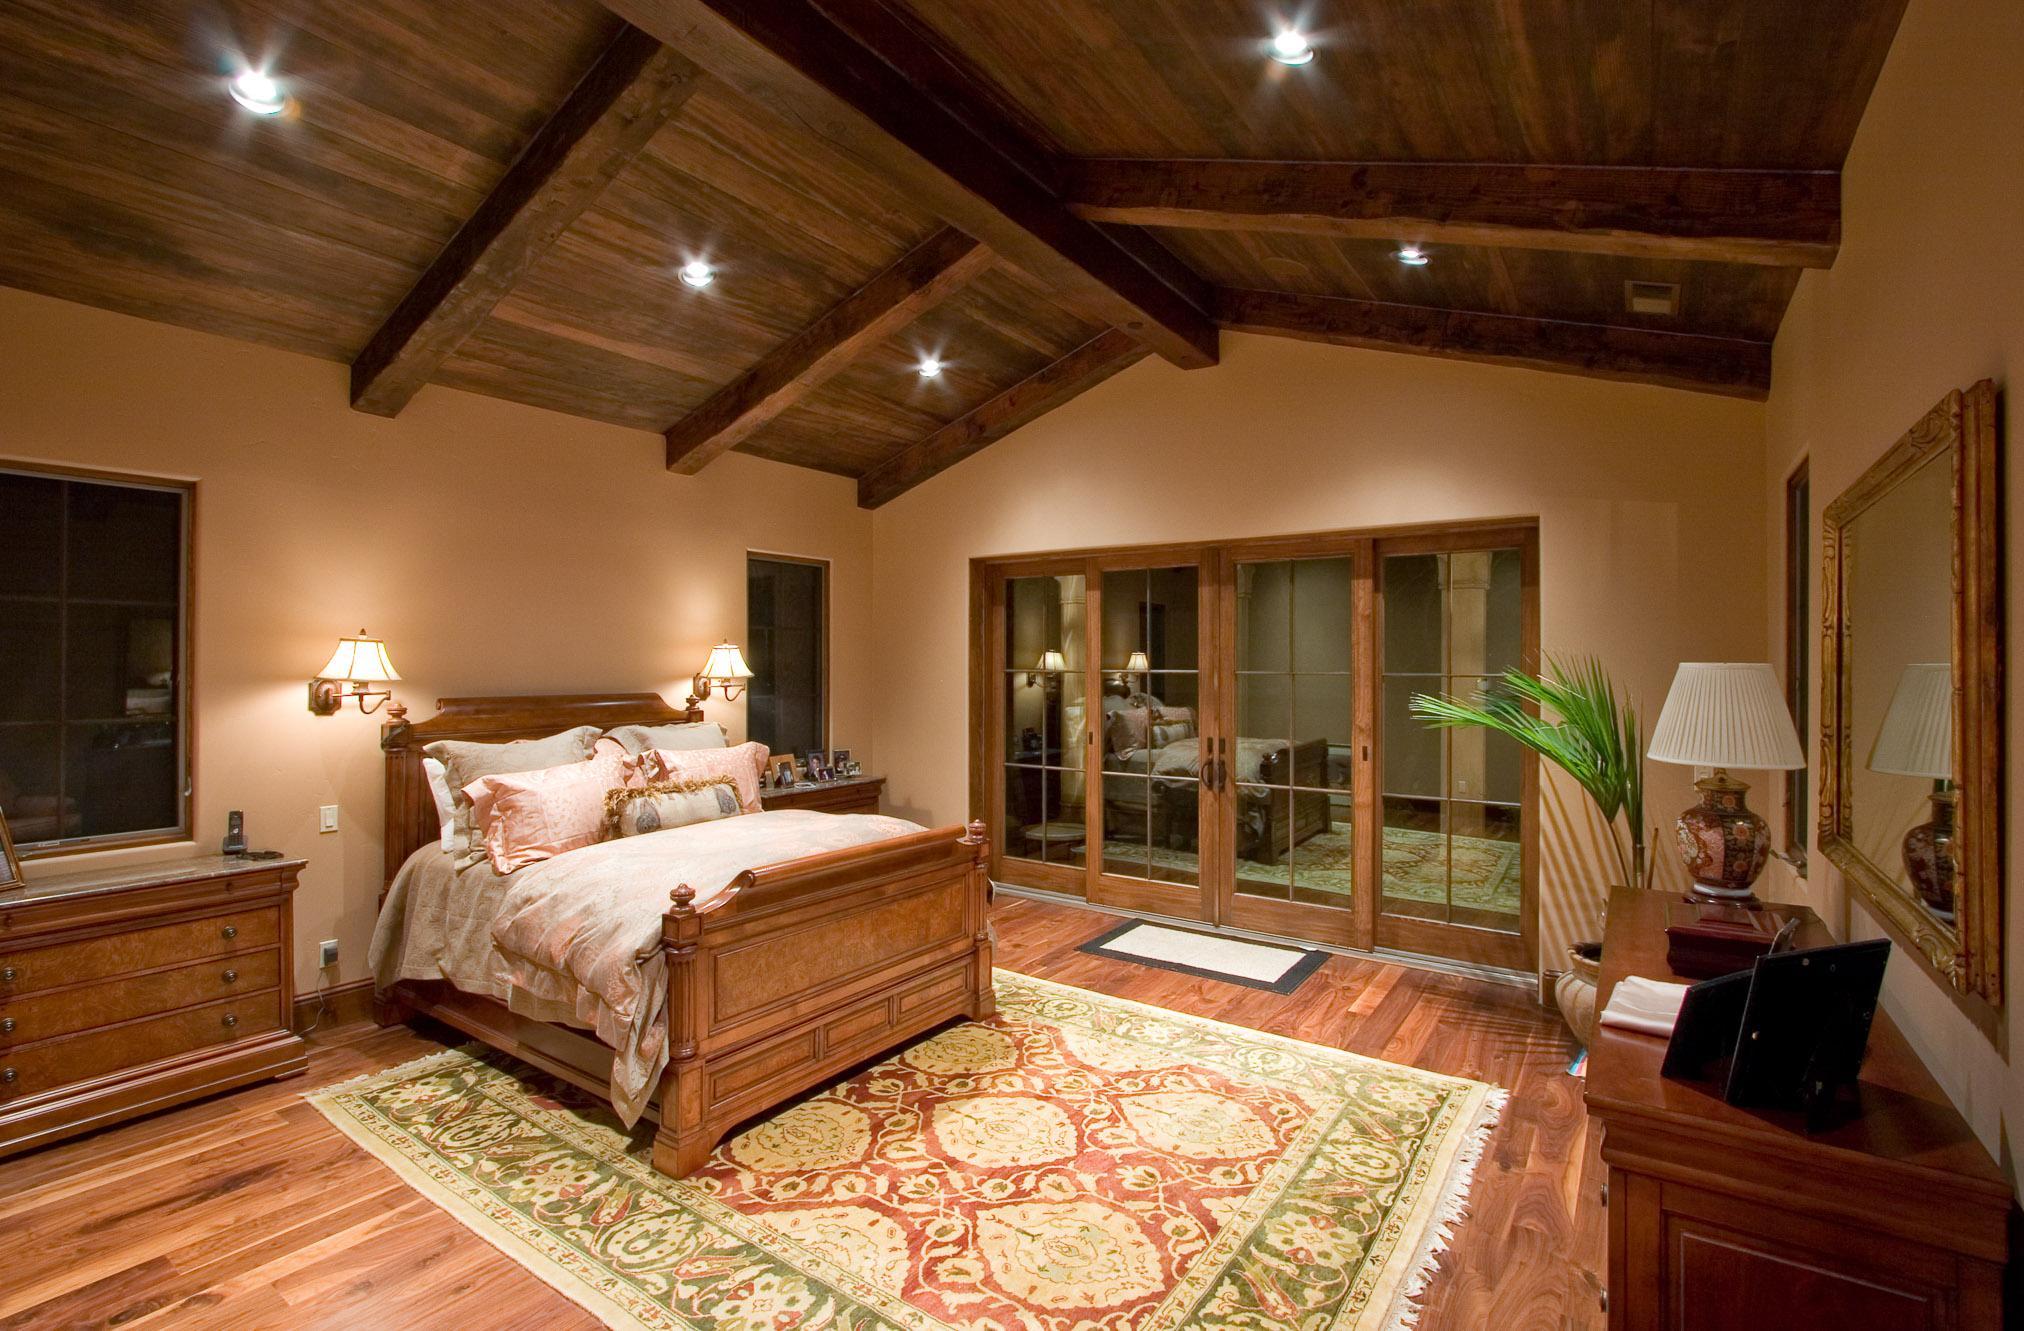 Northern California Santa Barbara Home Builder-10.jpg